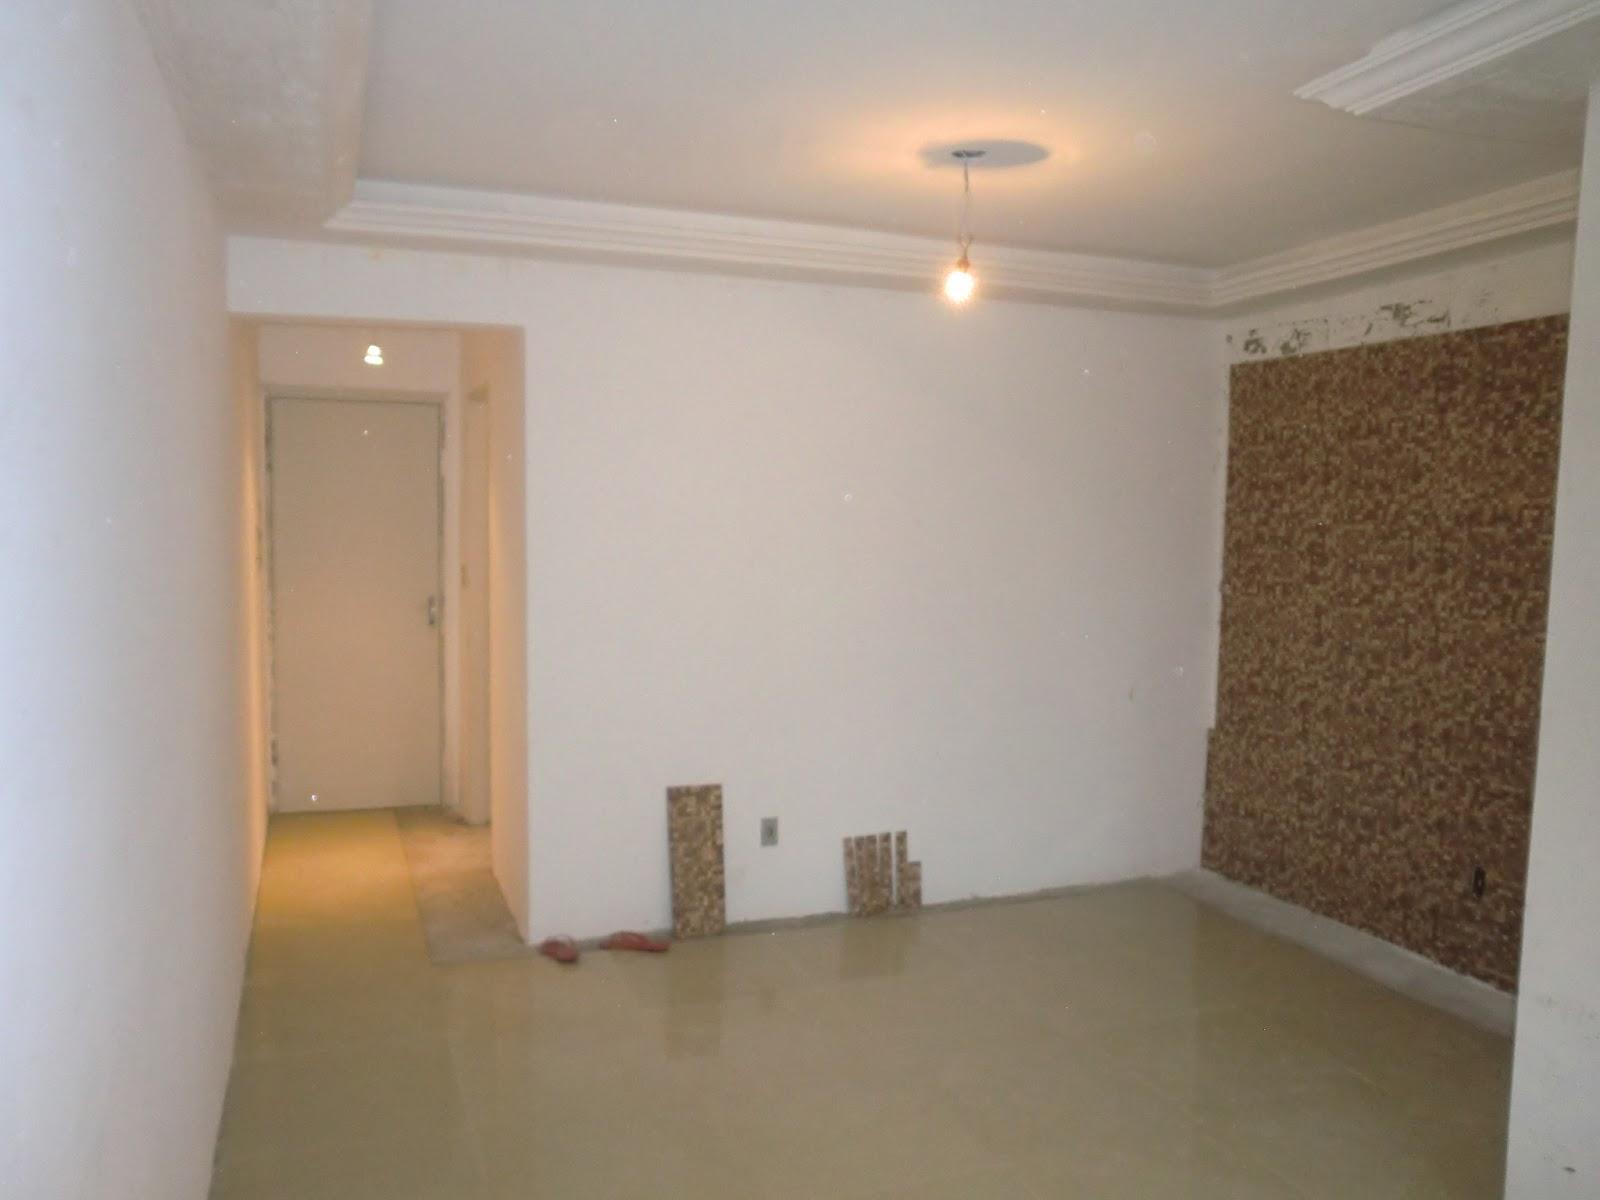 Porcelanato Na Sala Escada Revestida De Porcelanato Com Padro De  -> Sala Com O Piso Porcelanato Polido Cinza